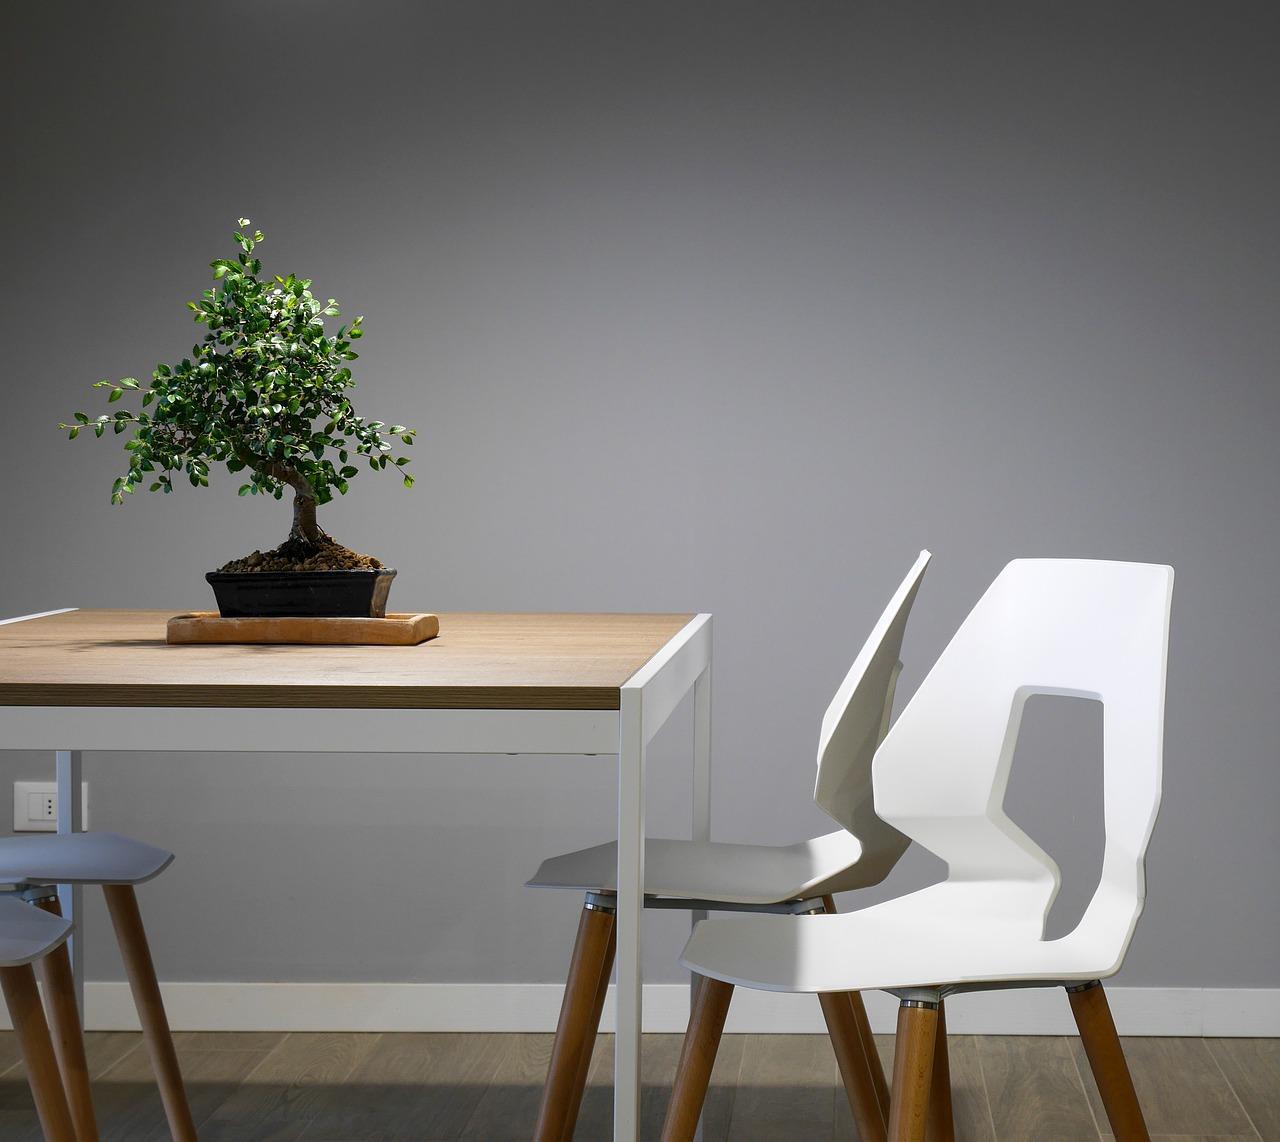 Cum alegi cele mai potrivite scaune pentru casa ta